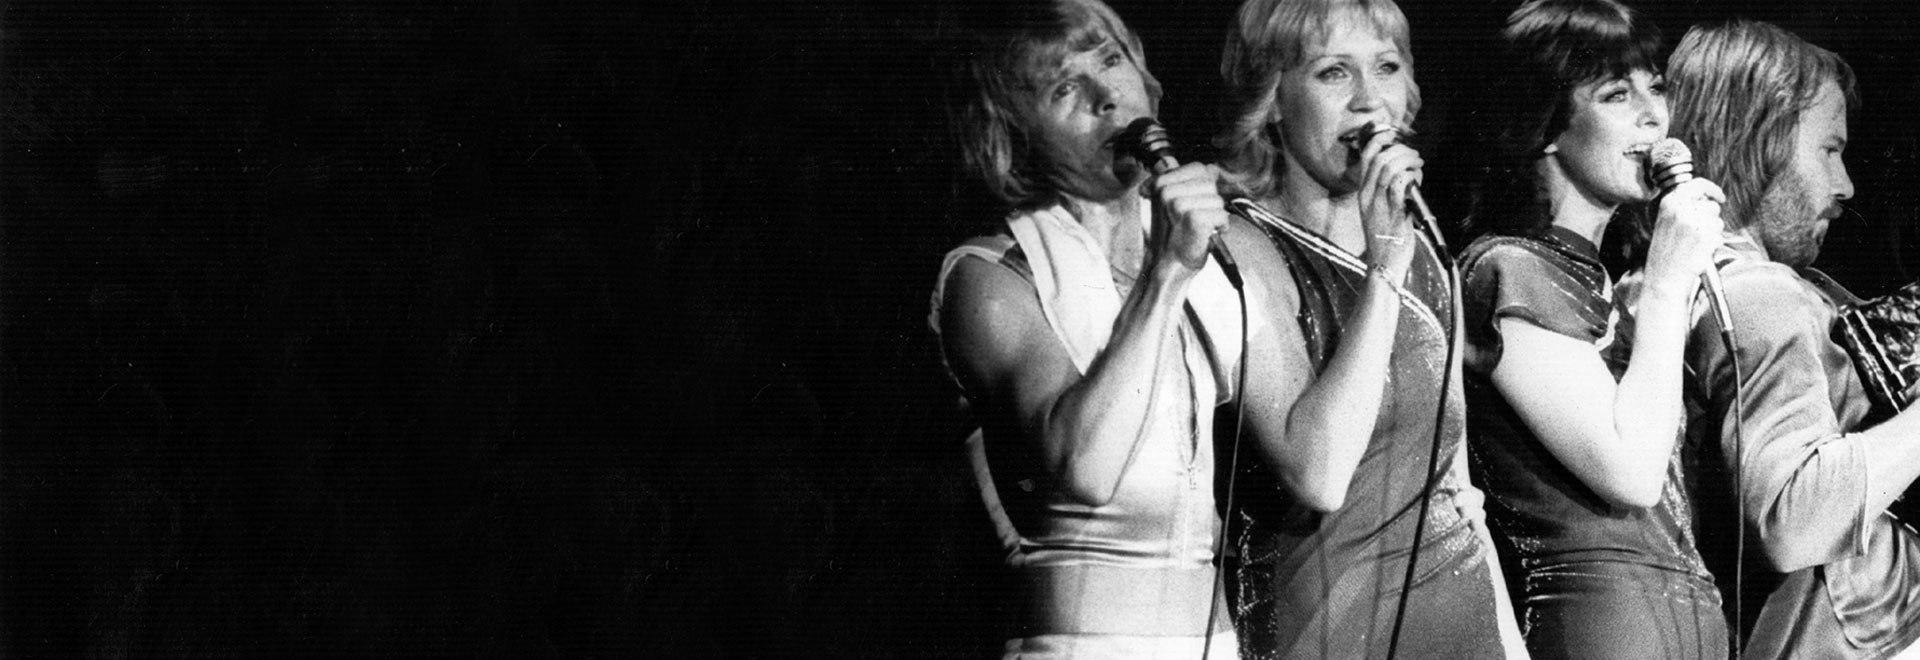 Euro Disco - Dagli ABBA ai Daft Punk